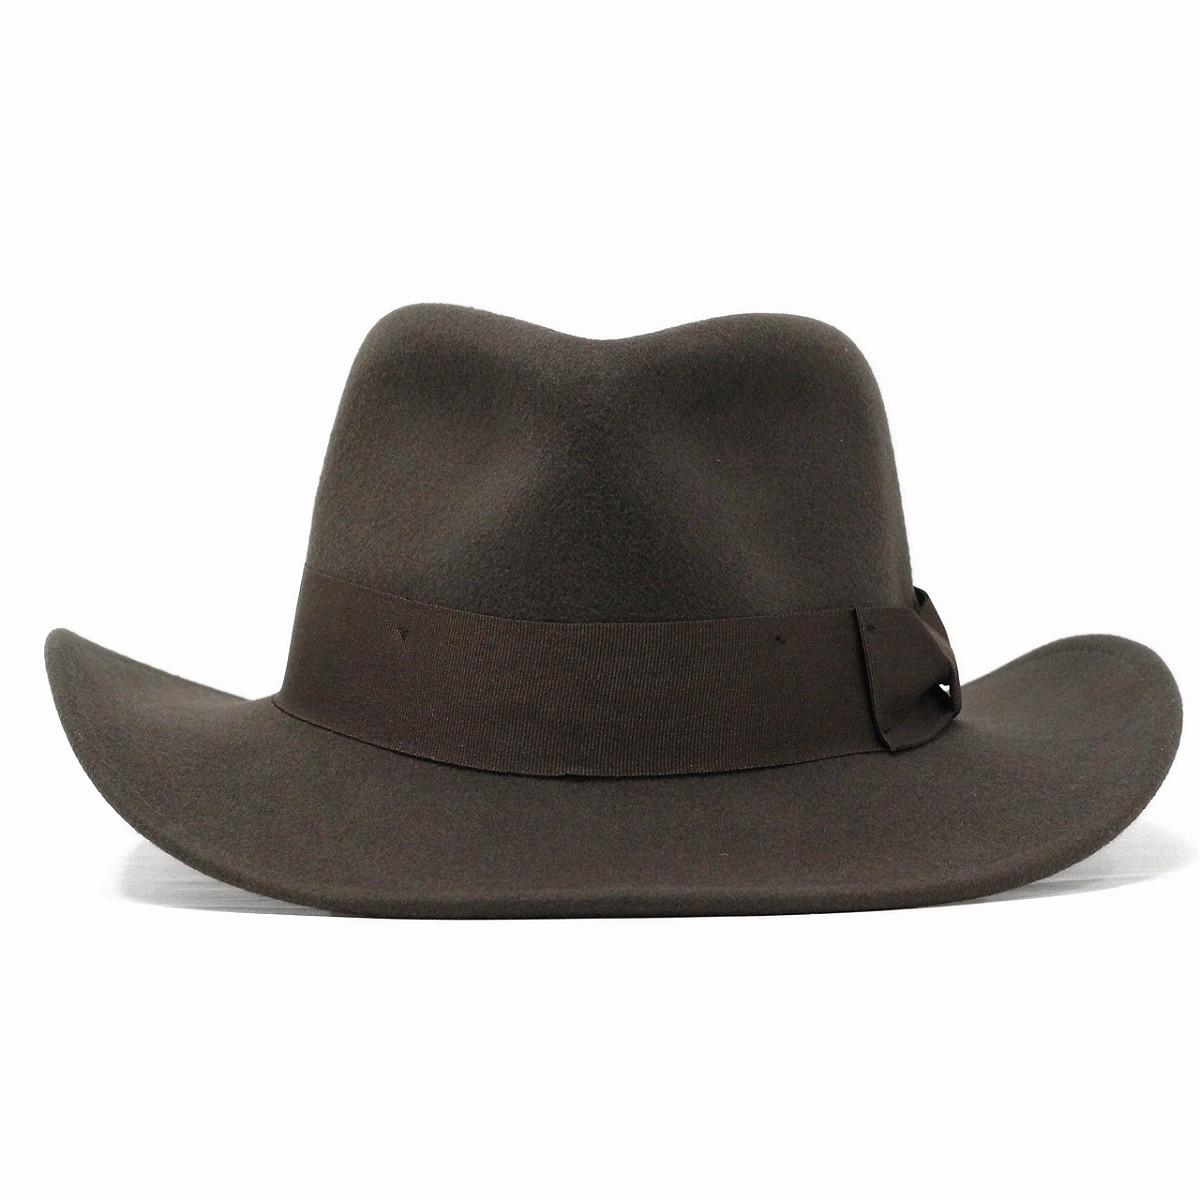 9319349e71ec8 ELEHELM HAT STORE  Wide brim Hat hats Indiana Jones wool felt Hat men s  imported INDIANA JONES wild autumn winter fashion   Brown Brown